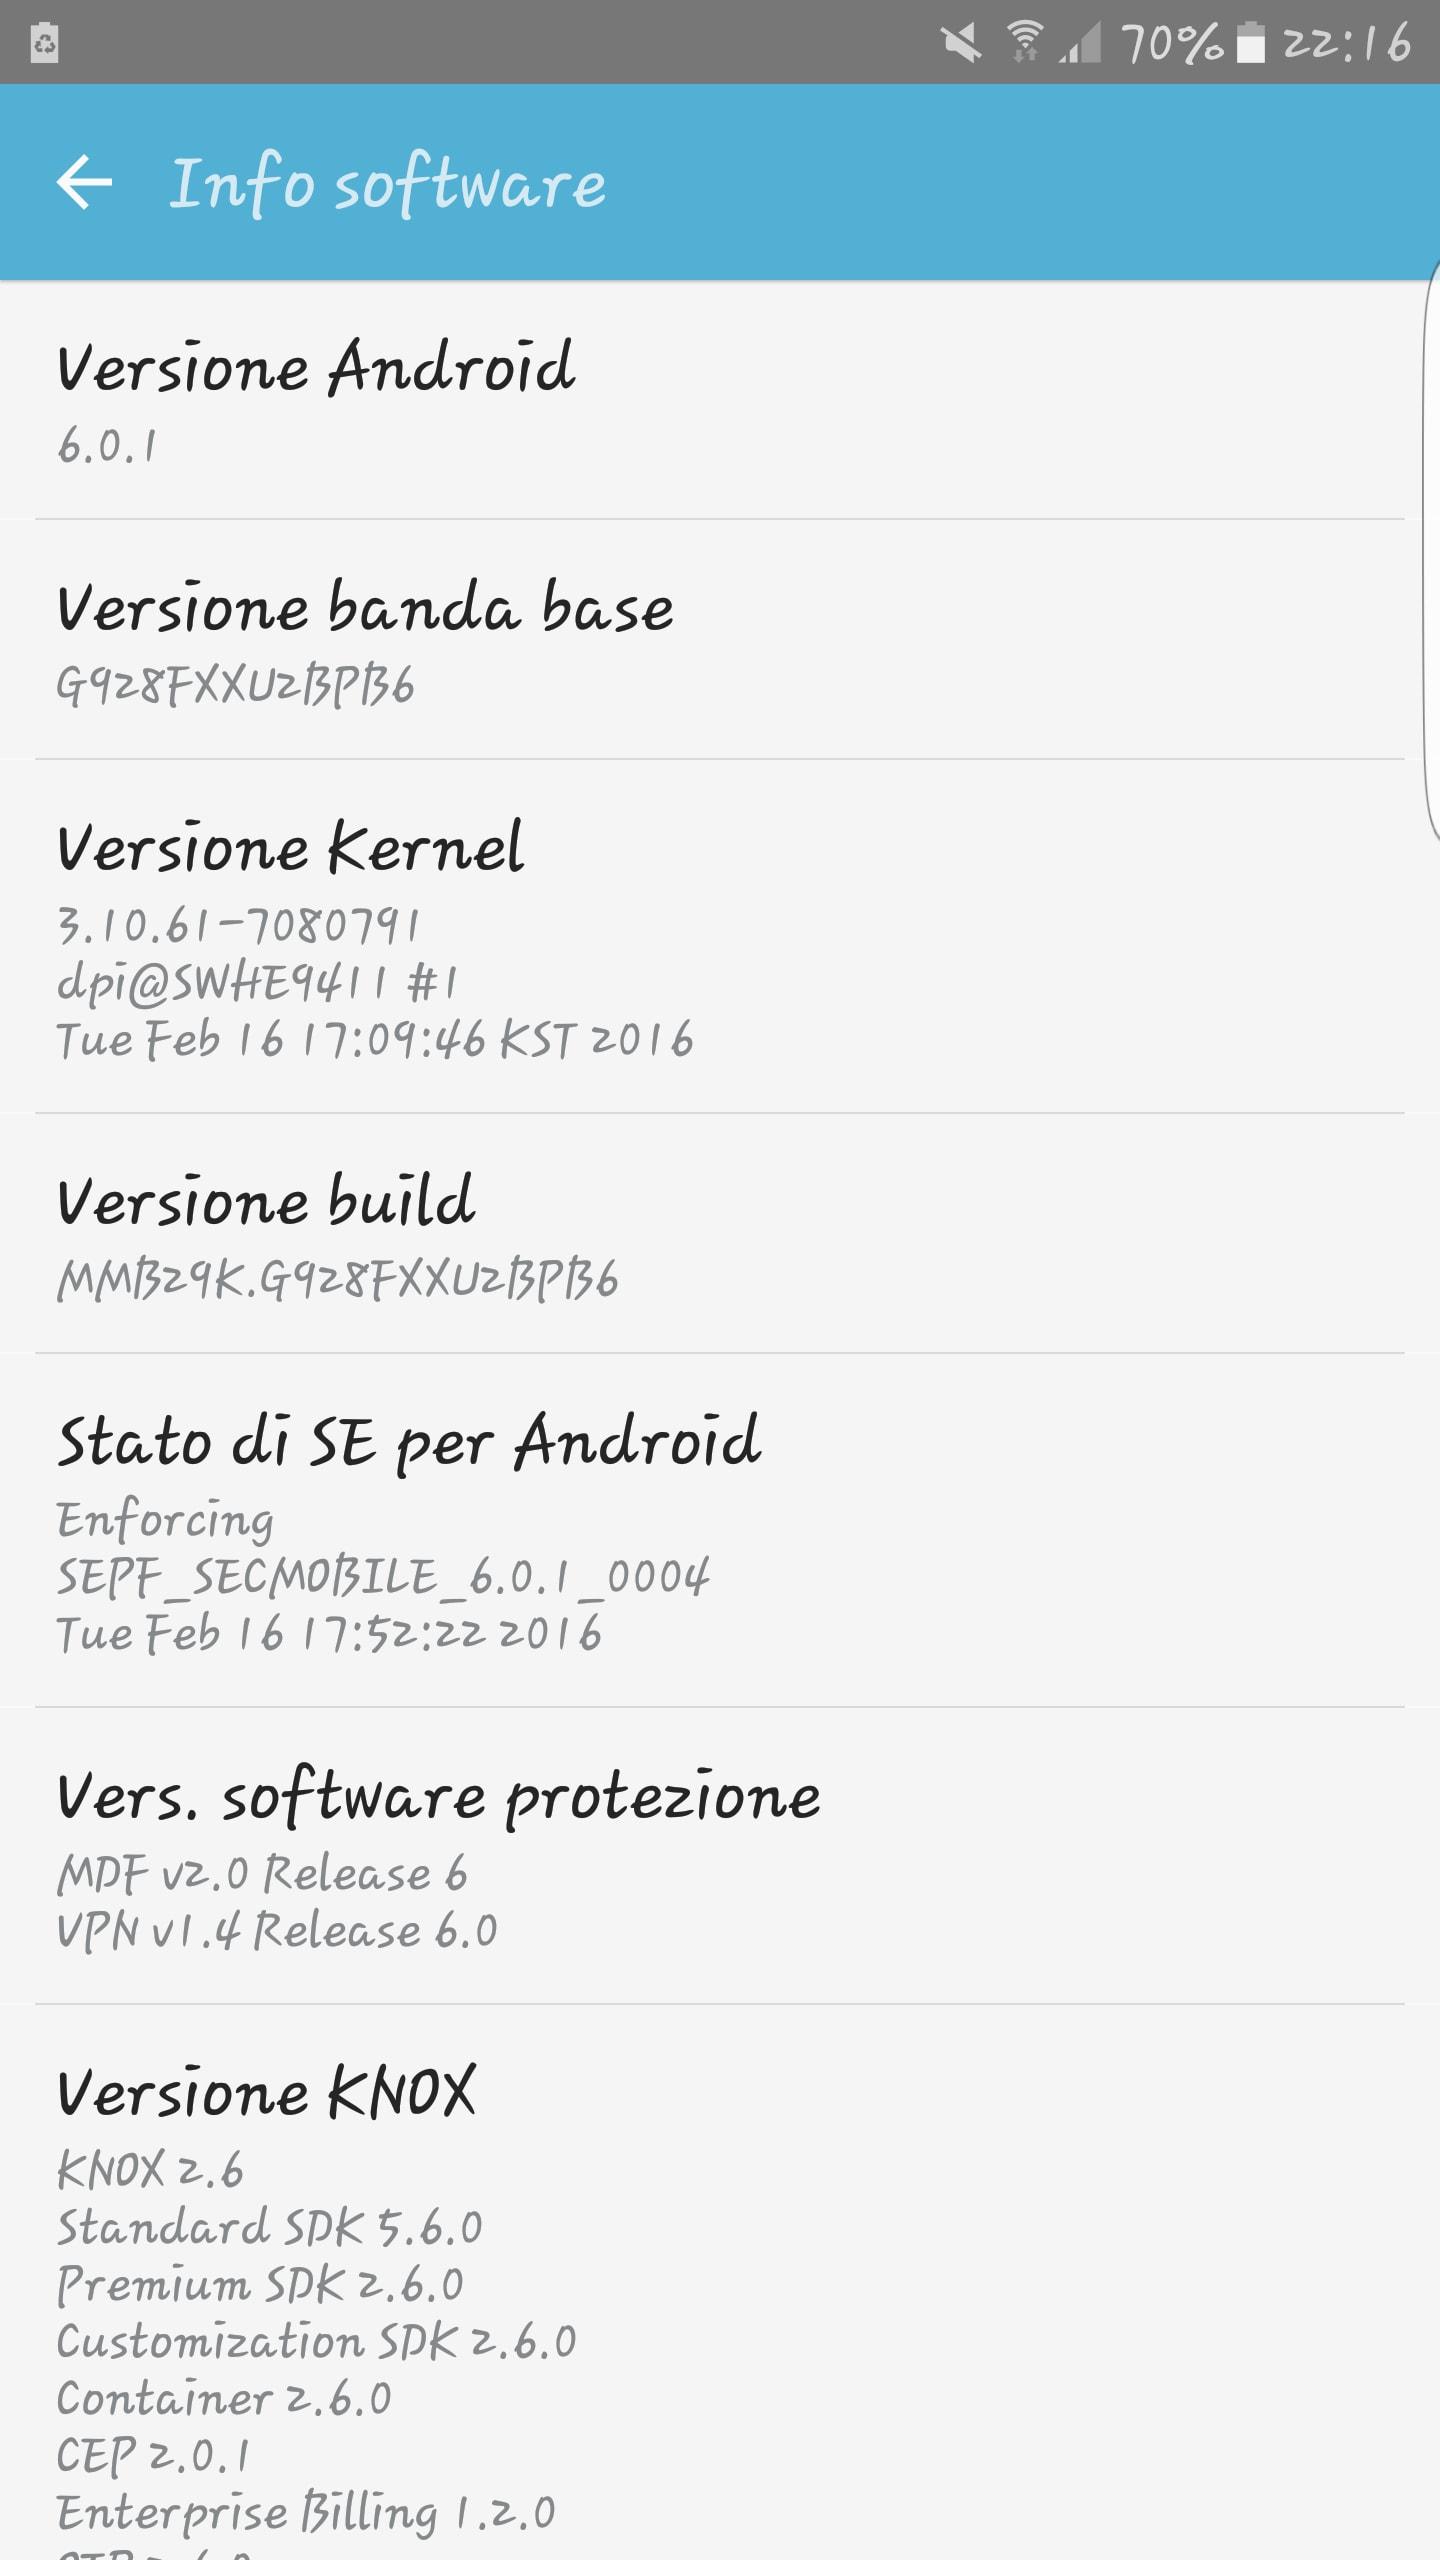 Android 6.0.1 Marshmallow per Samsung Galaxy S6 edge+ – 1